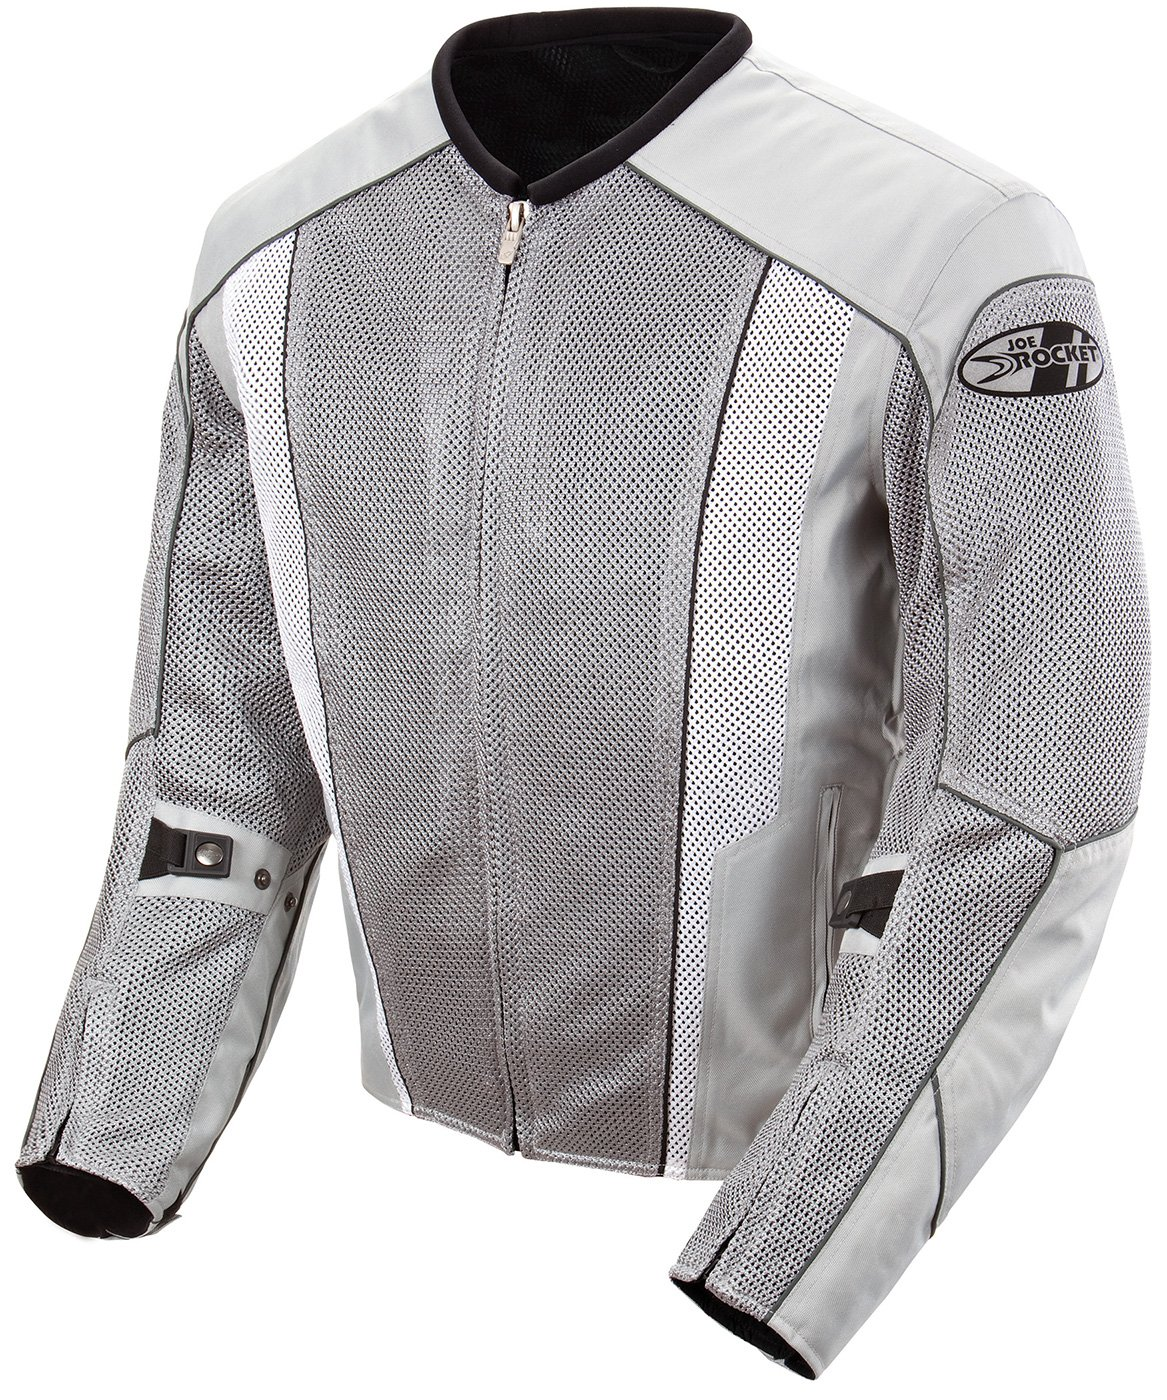 Joe Rocket Phoenix 5.0 Men's Mesh Motorcycle Riding Jacket (Silver/Silver, Medium)